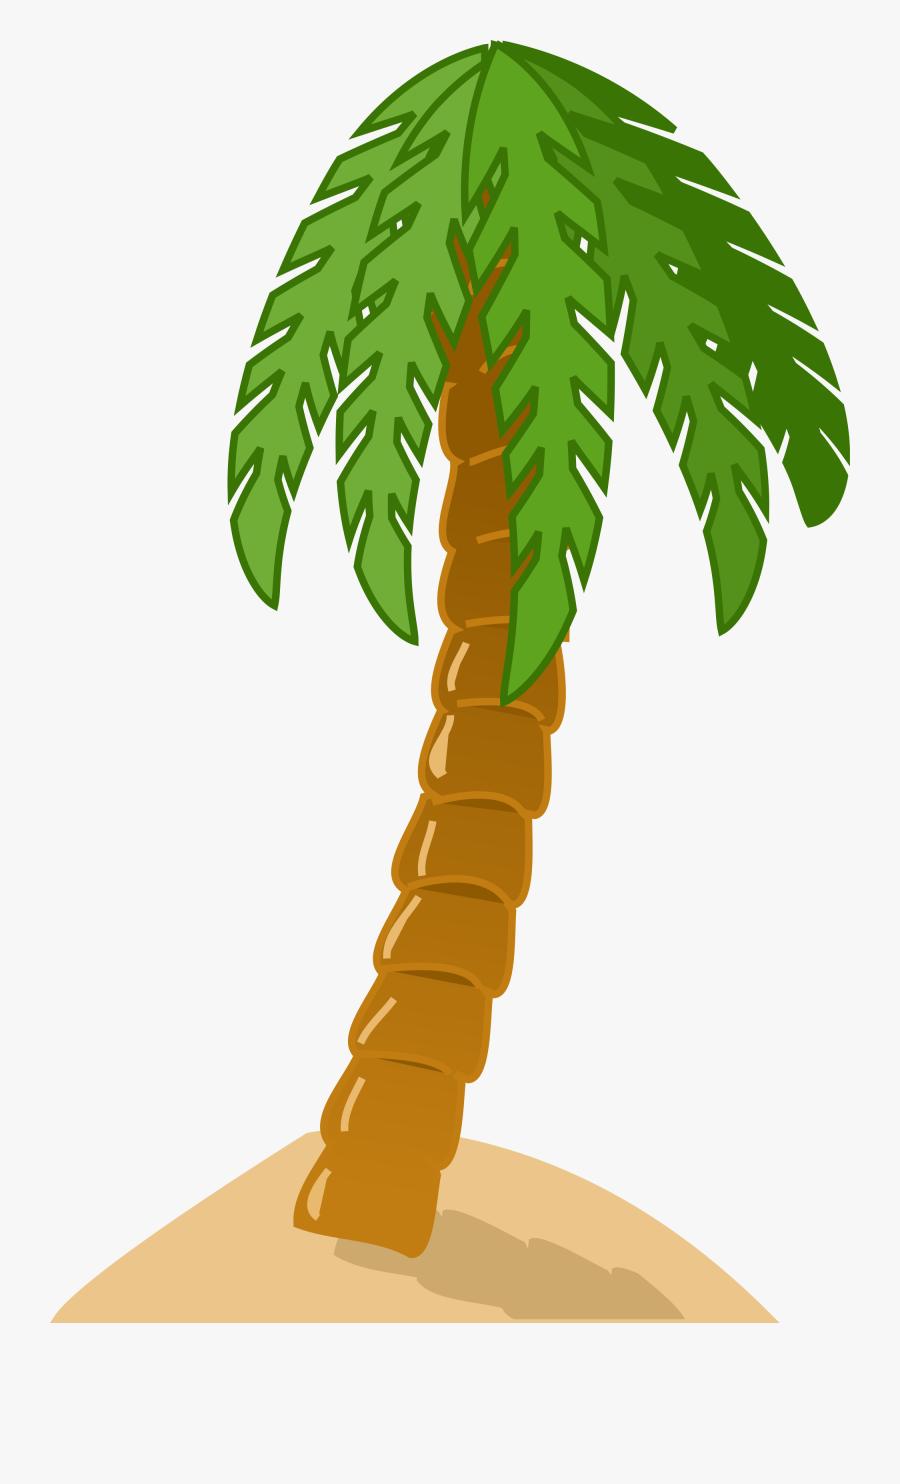 Palm Tree Clipart Sand - Palm Tree Clip Art, Transparent Clipart